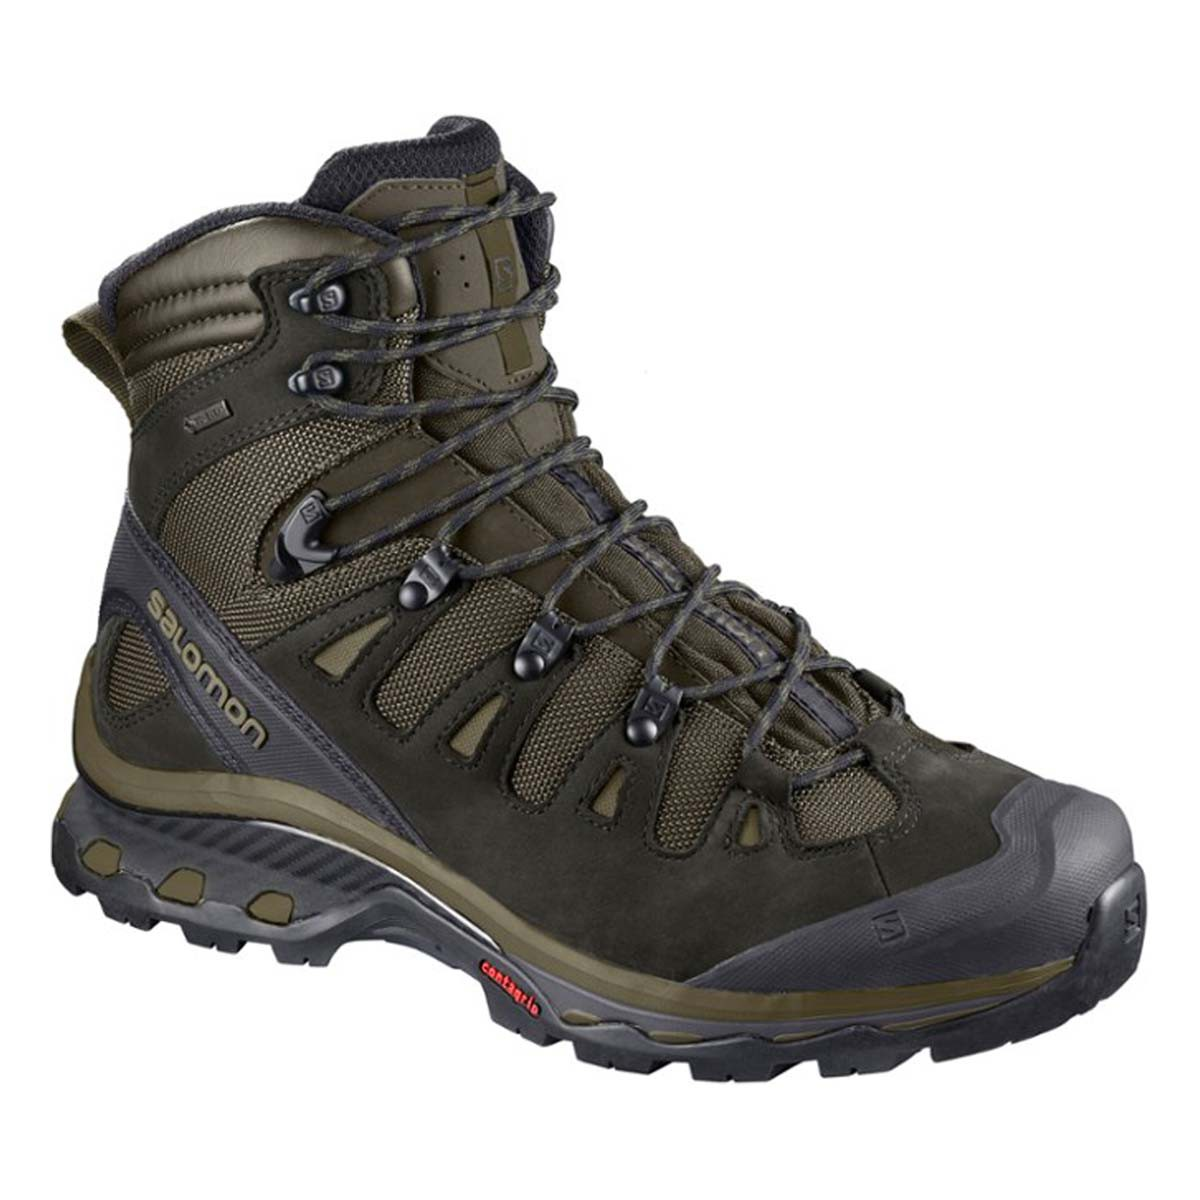 Lowa Sticker Decal Hiking Climbing Mens Womens Boots Jacket Pants Tent Shoes Shi